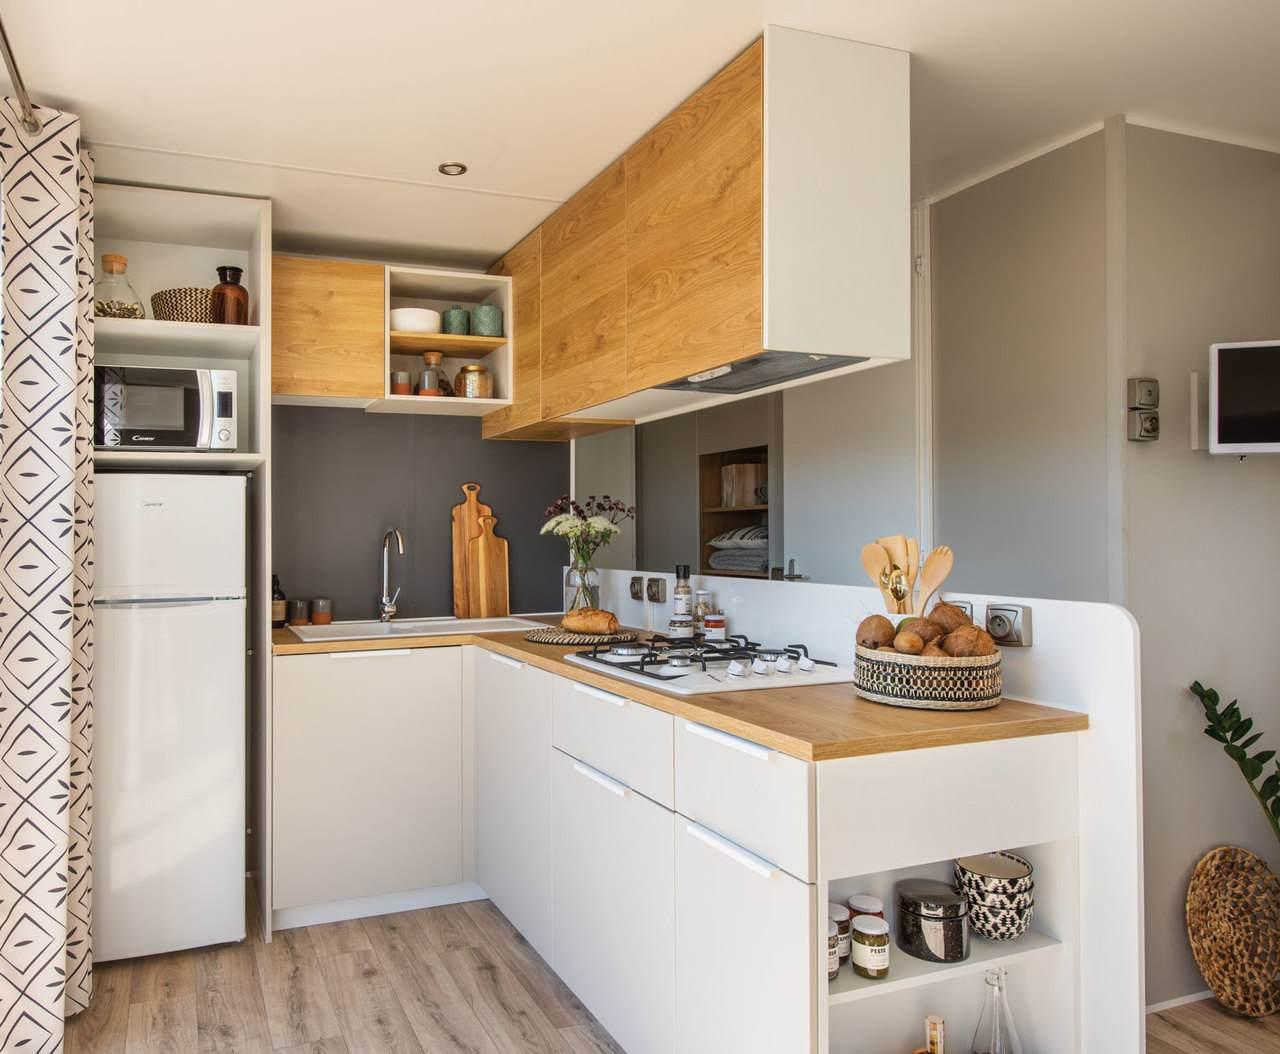 Cuisine-prestige-luxe-confort-camping-cinq-étoiles